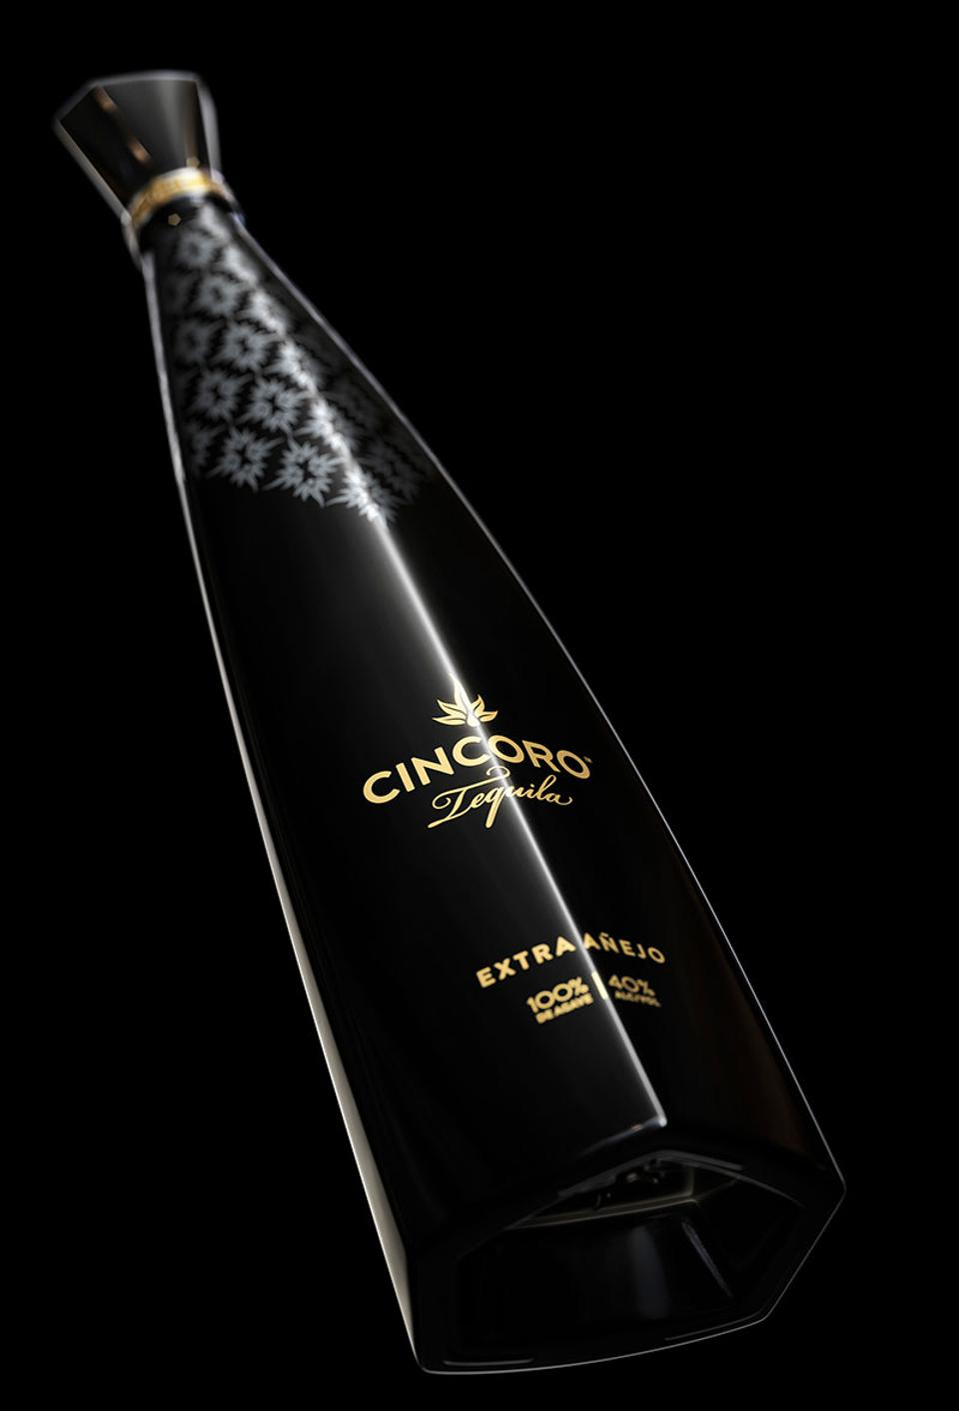 Cincoro-Extra-Anejo-Closeup-by-Danil-Gorskikh-Secondary